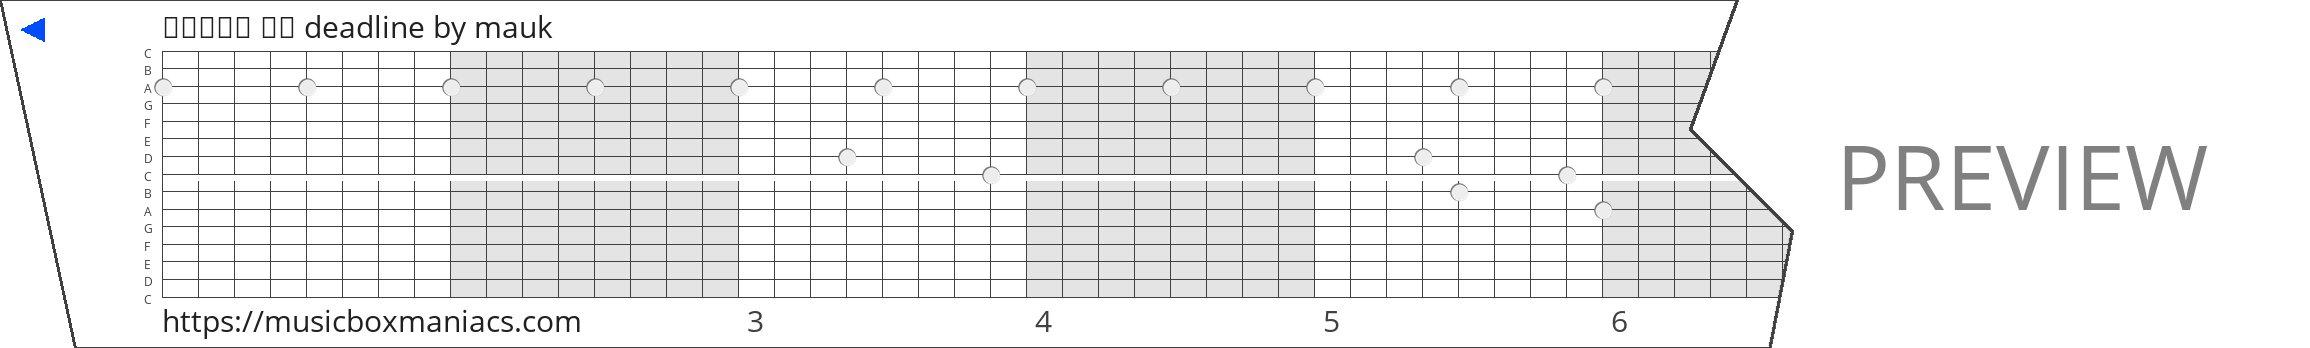 𝖢𝗅𝗈𝗇𝖾 𝗈𝖿 deadline 15 note music box paper strip